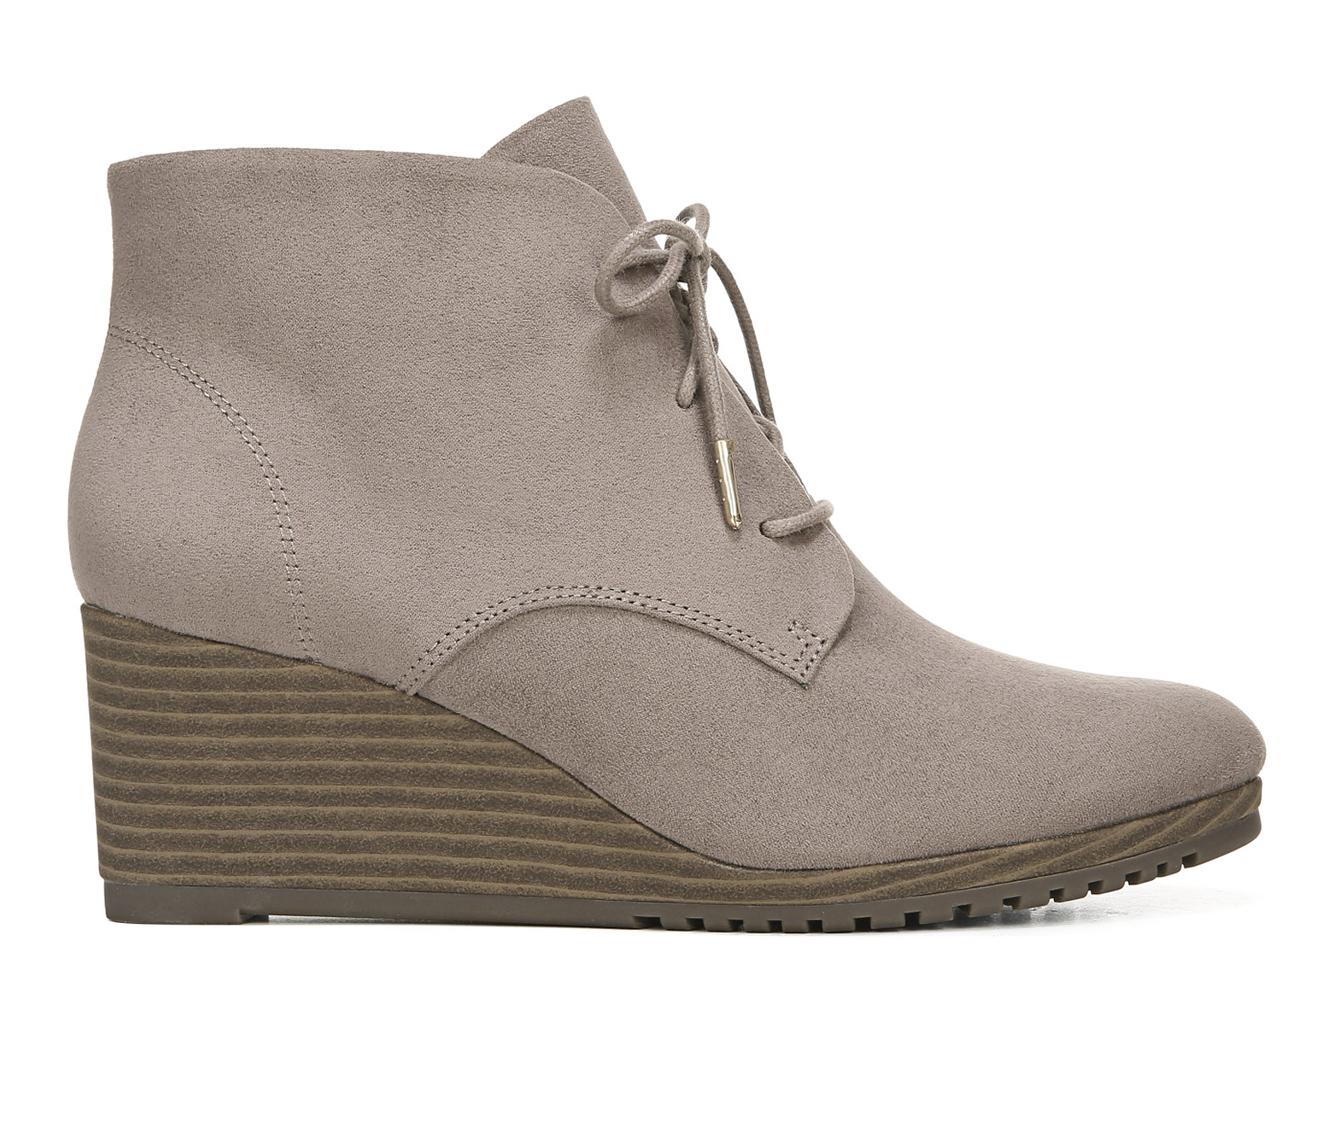 Dr. Scholls Ceelia Women's Boot (Gray Canvas)